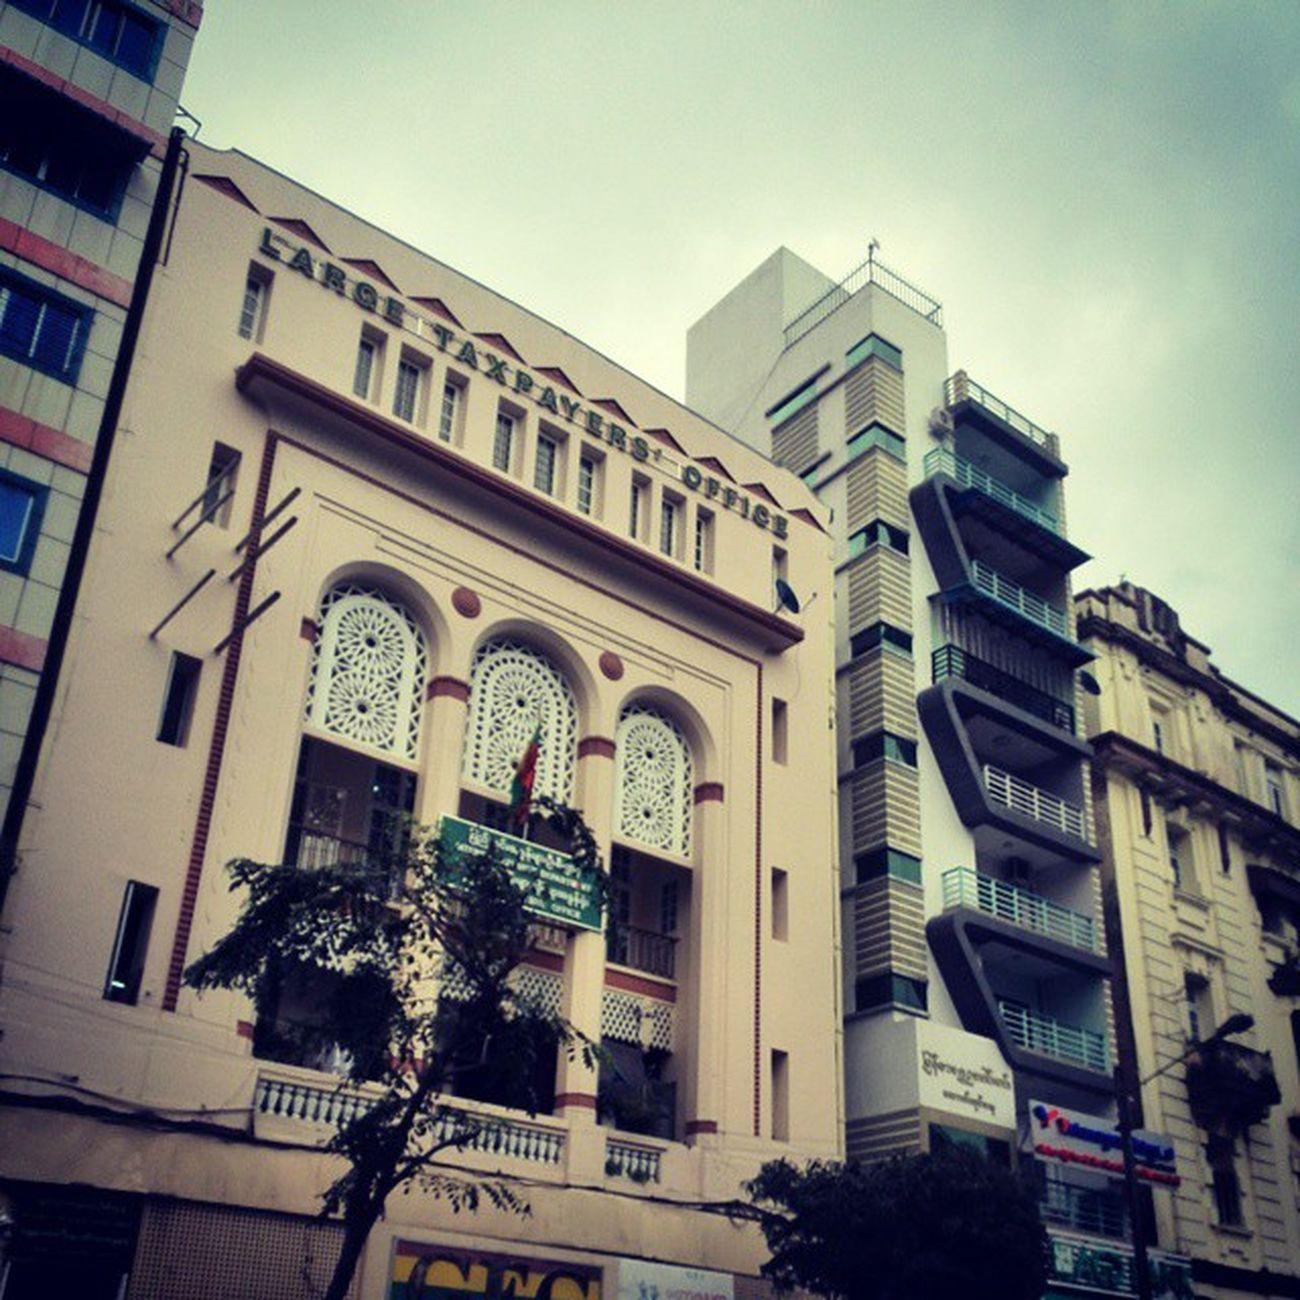 Antique Vs. Modern Architecture Yangon YangonArchitecture Downtown Pansodan AntiqueVS .Modern